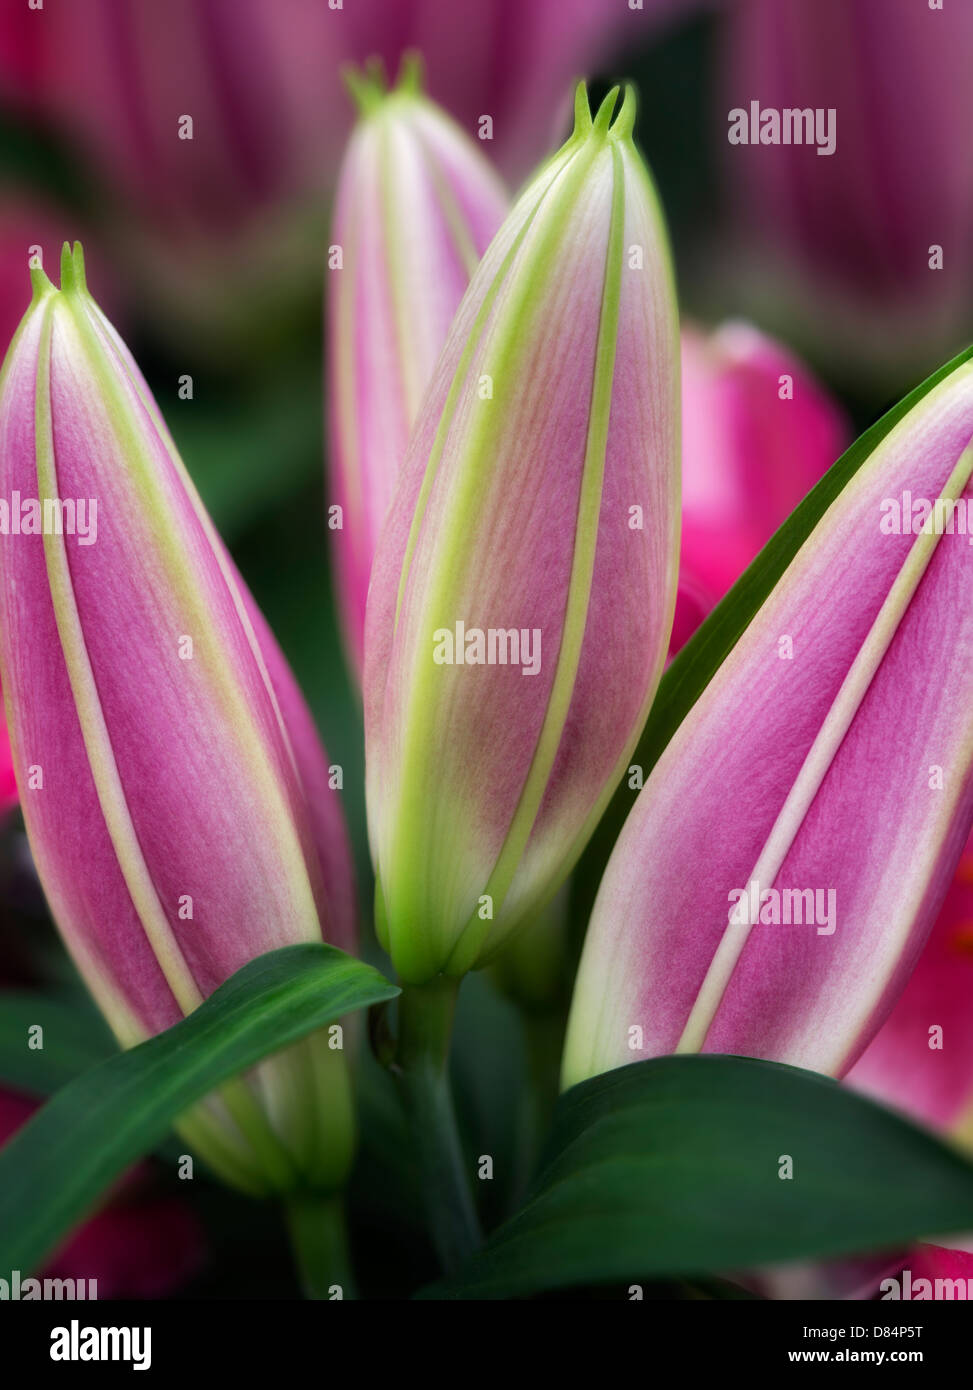 Cerca de Lily Oriental yemas. Imagen De Stock